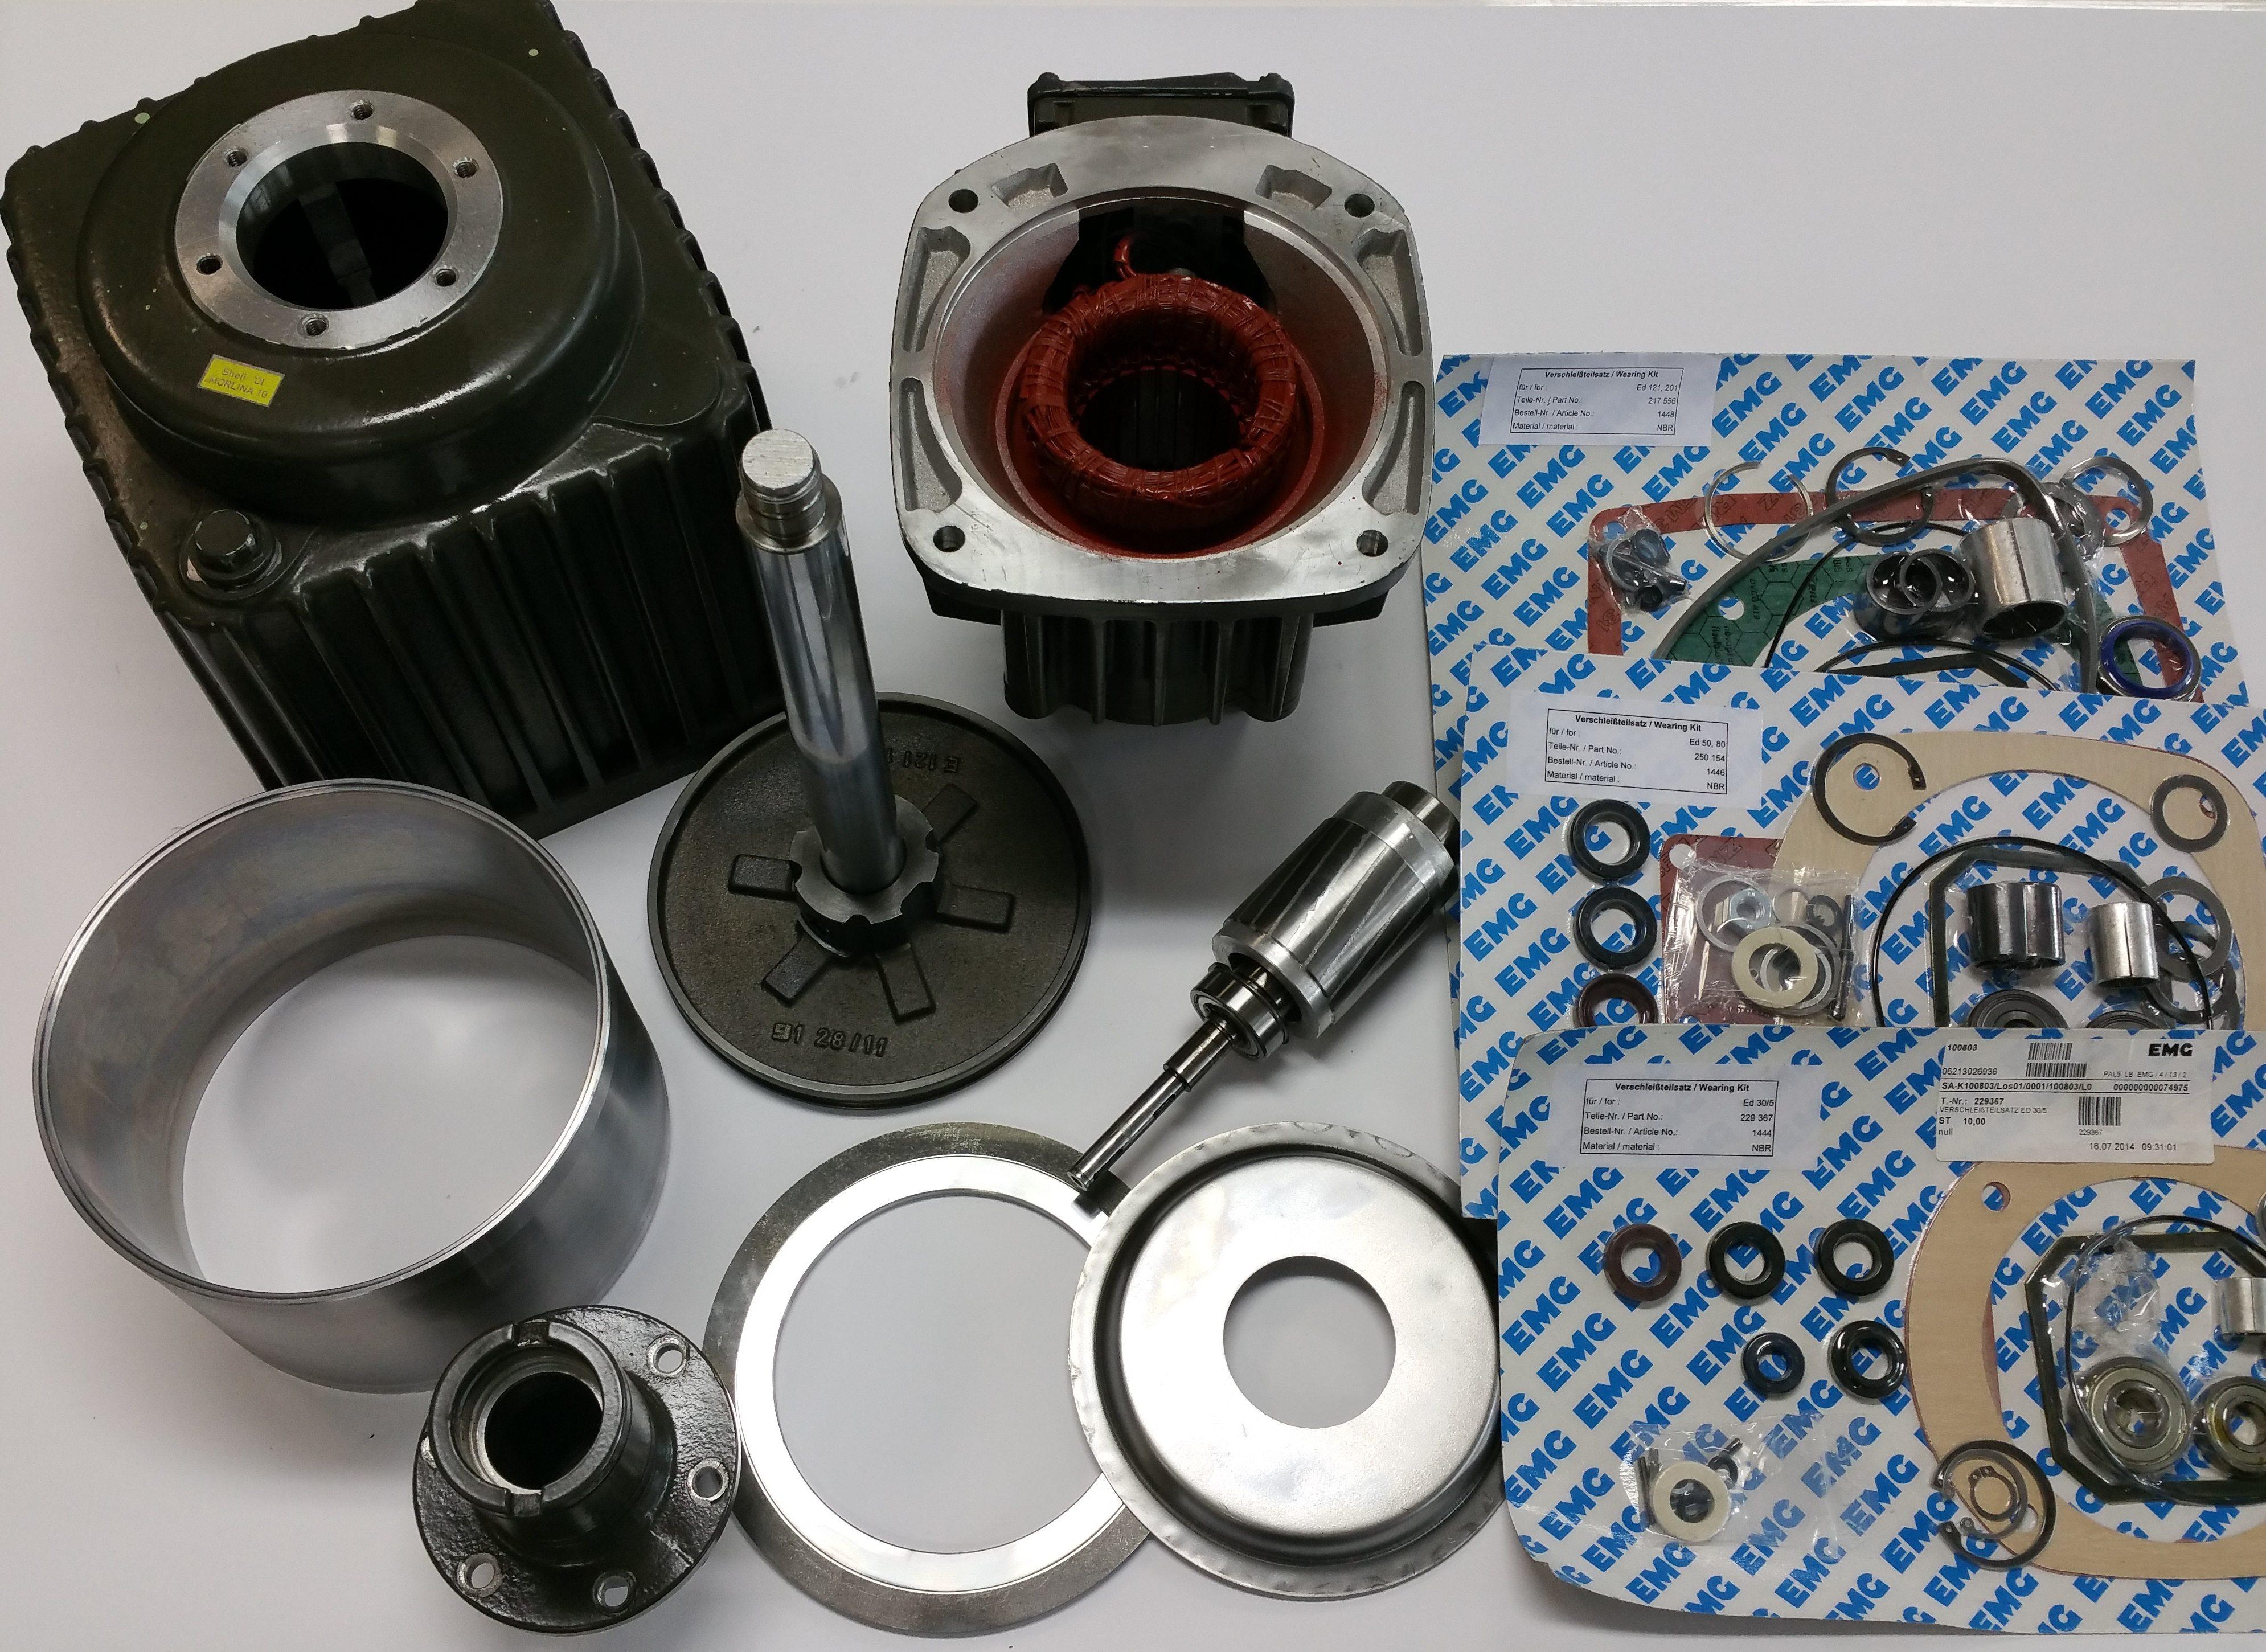 Thruster Repairs